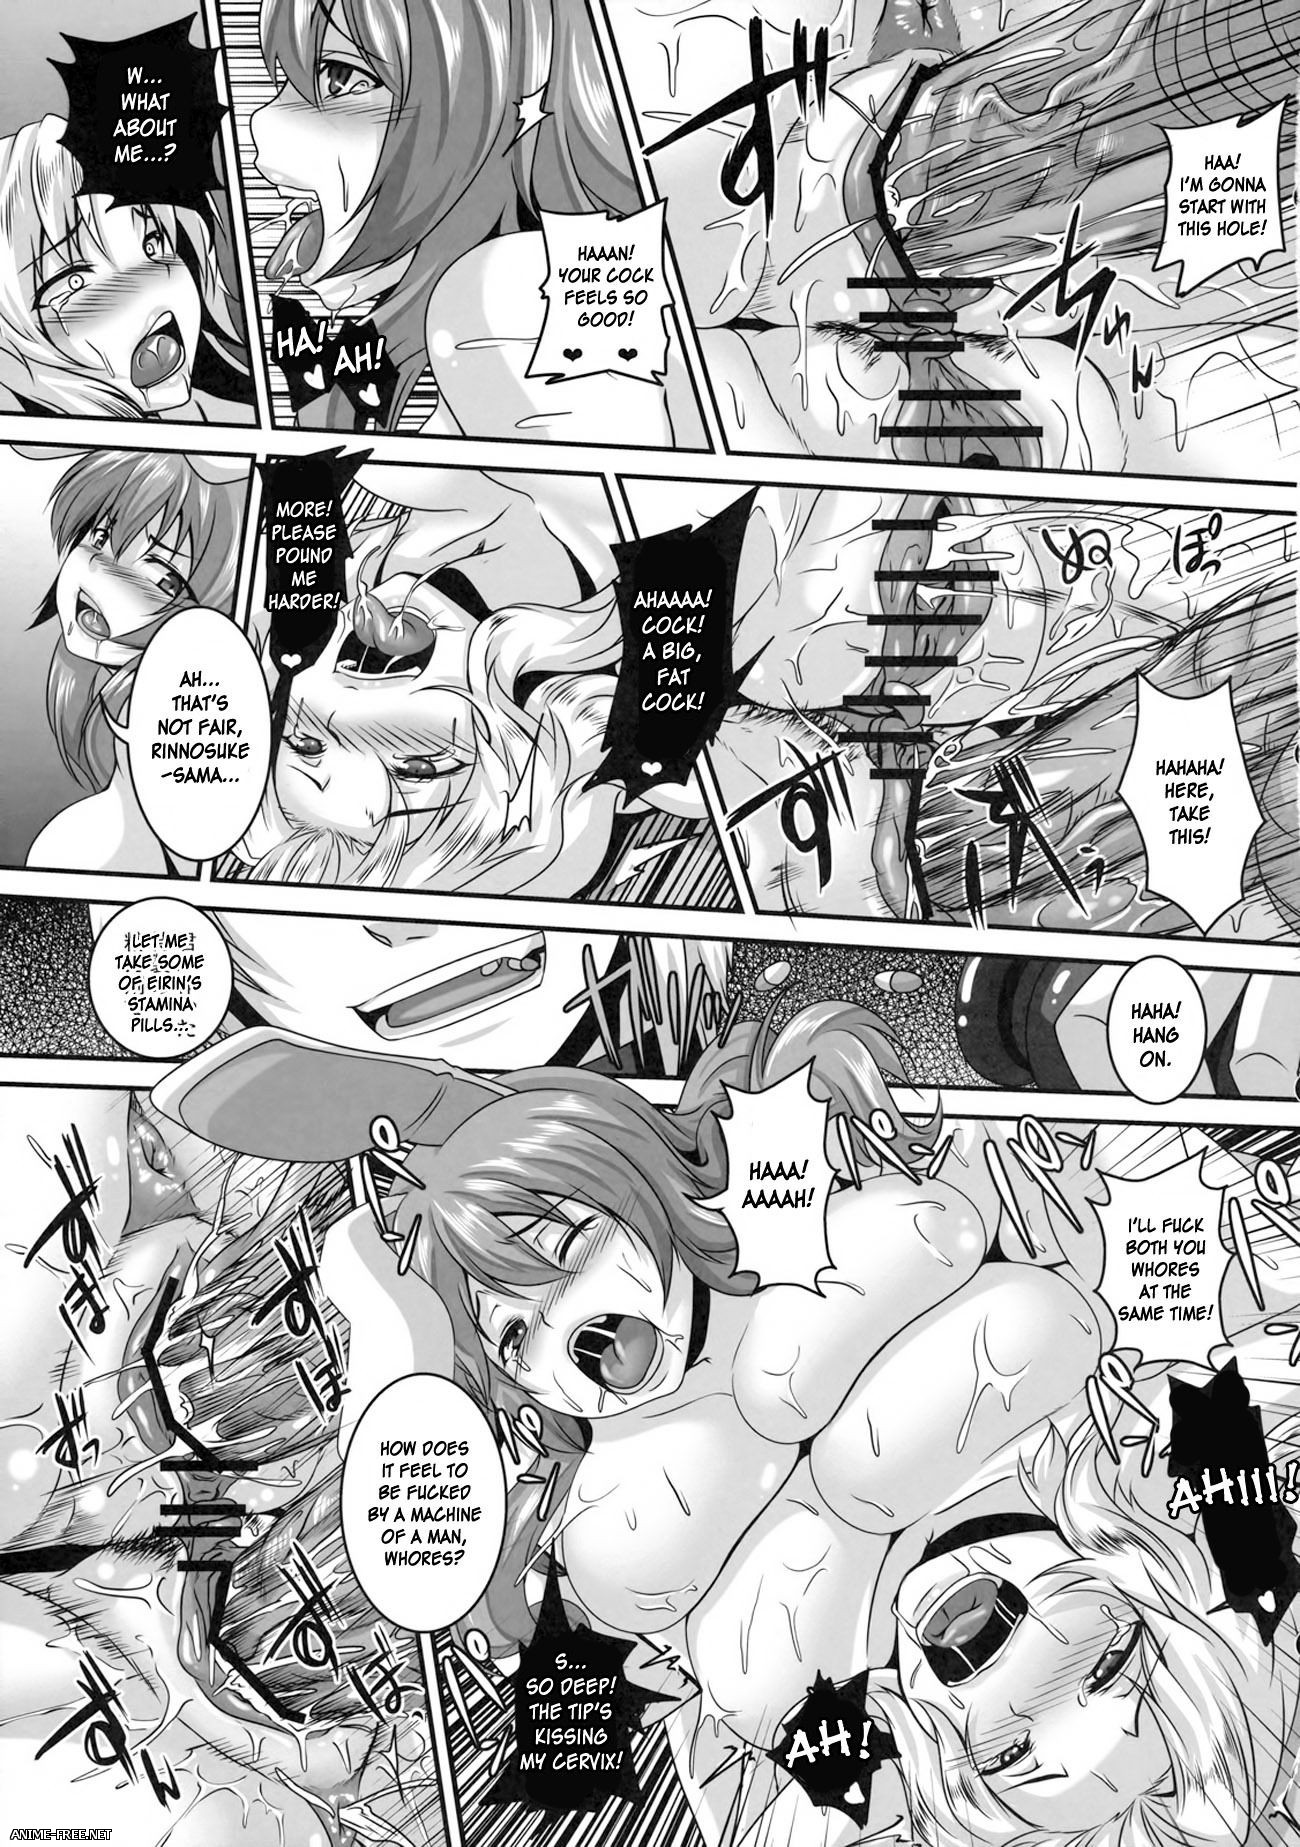 Kazuhiro / Tiramisu Tart - Сборник хентай манги [Ptcen] [JAP,ENG] Manga Hentai